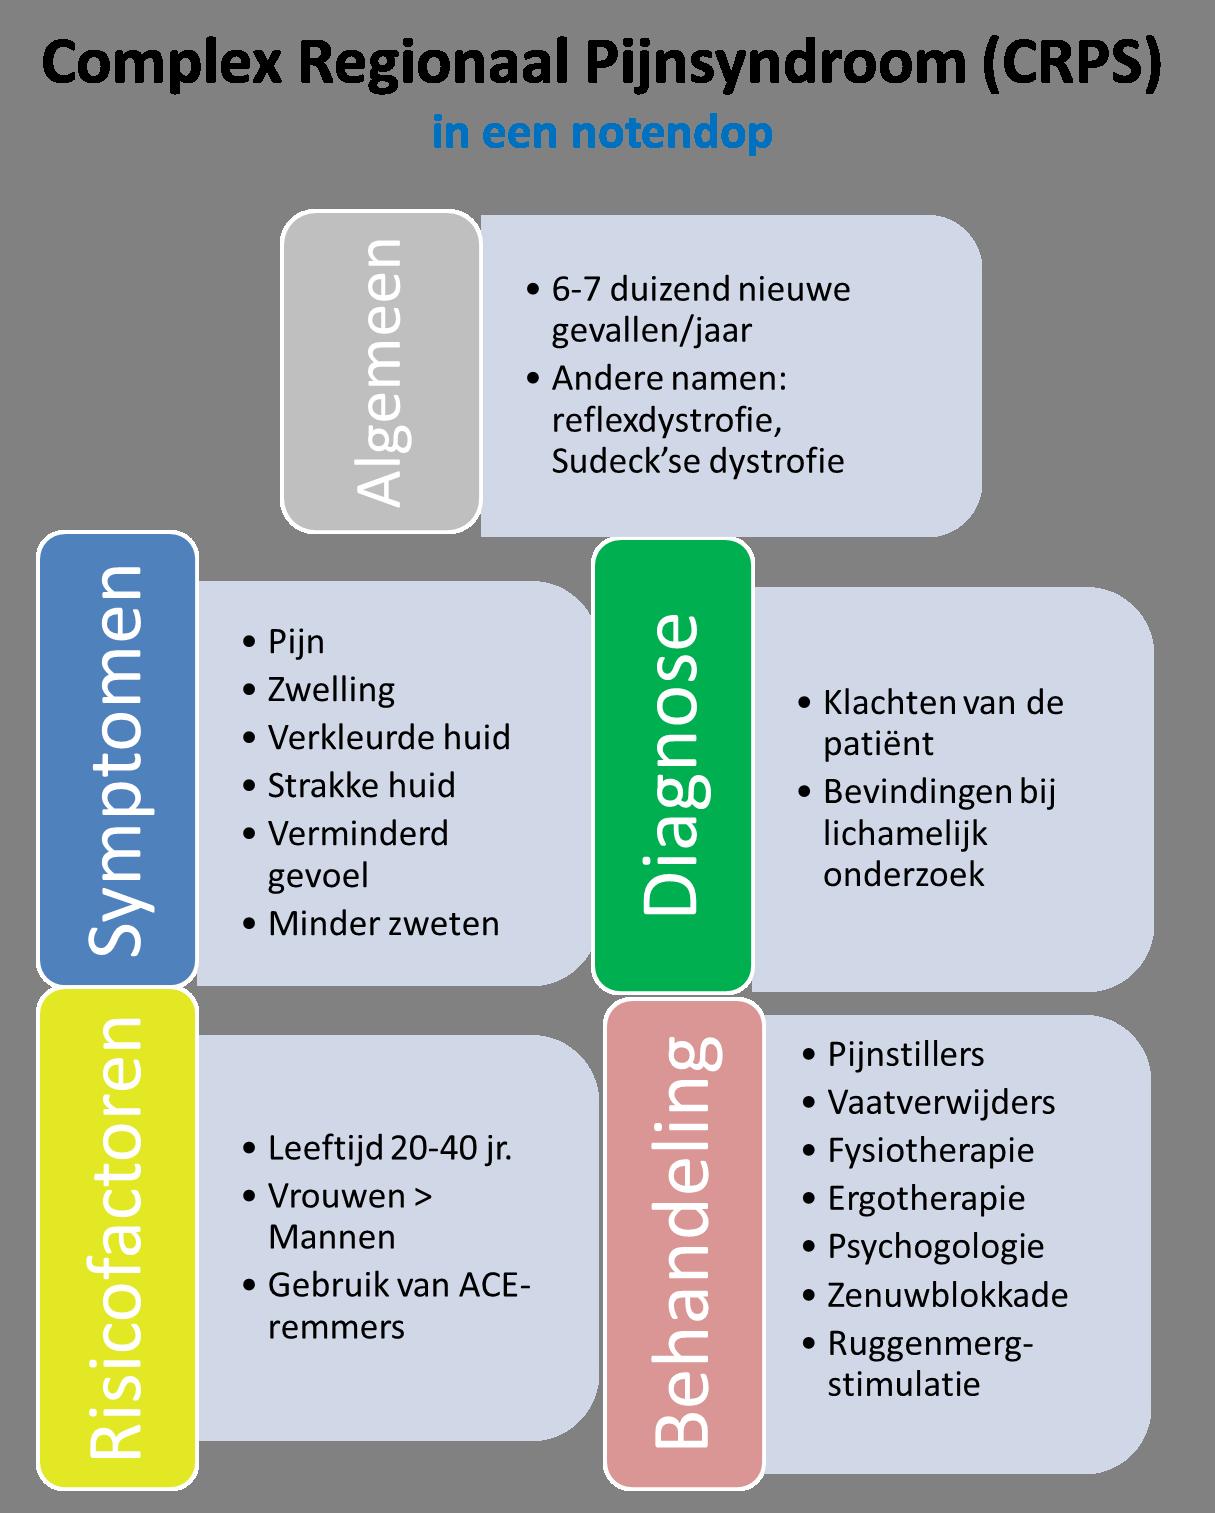 CRPS infographic (complex regionaal pijnsyndroom)